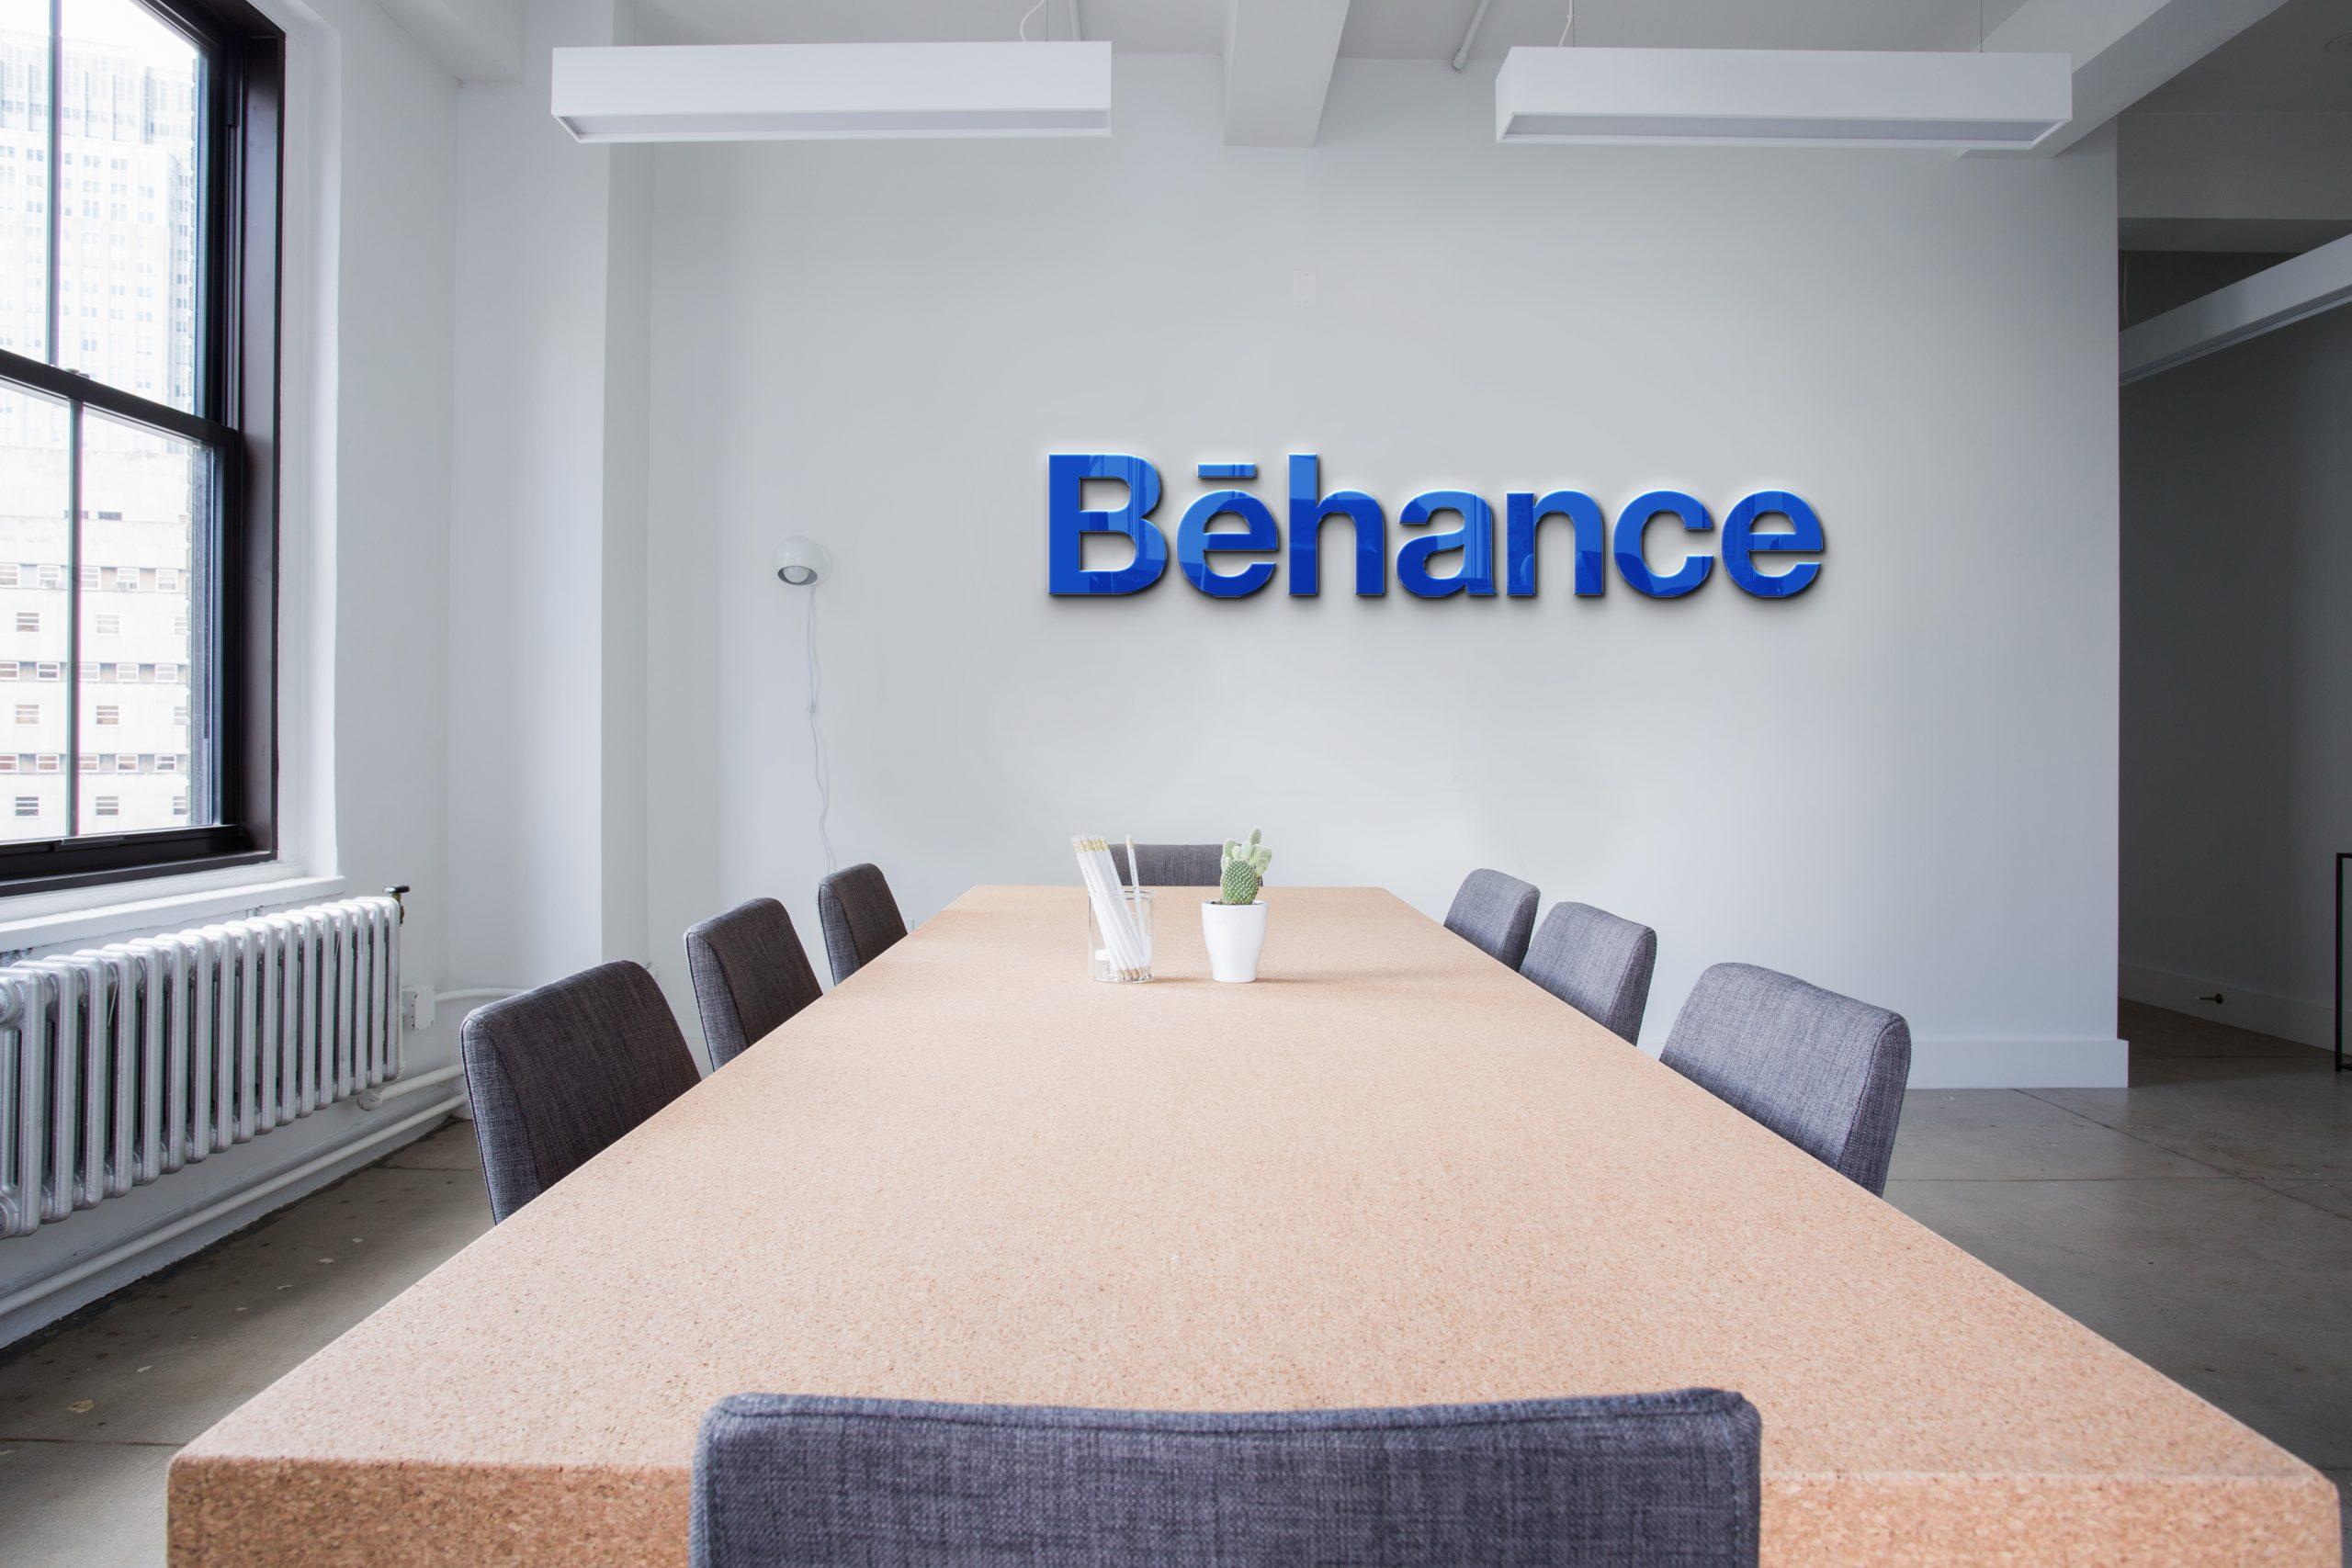 Behance-Company-Free-Conference-room-logo-mockup